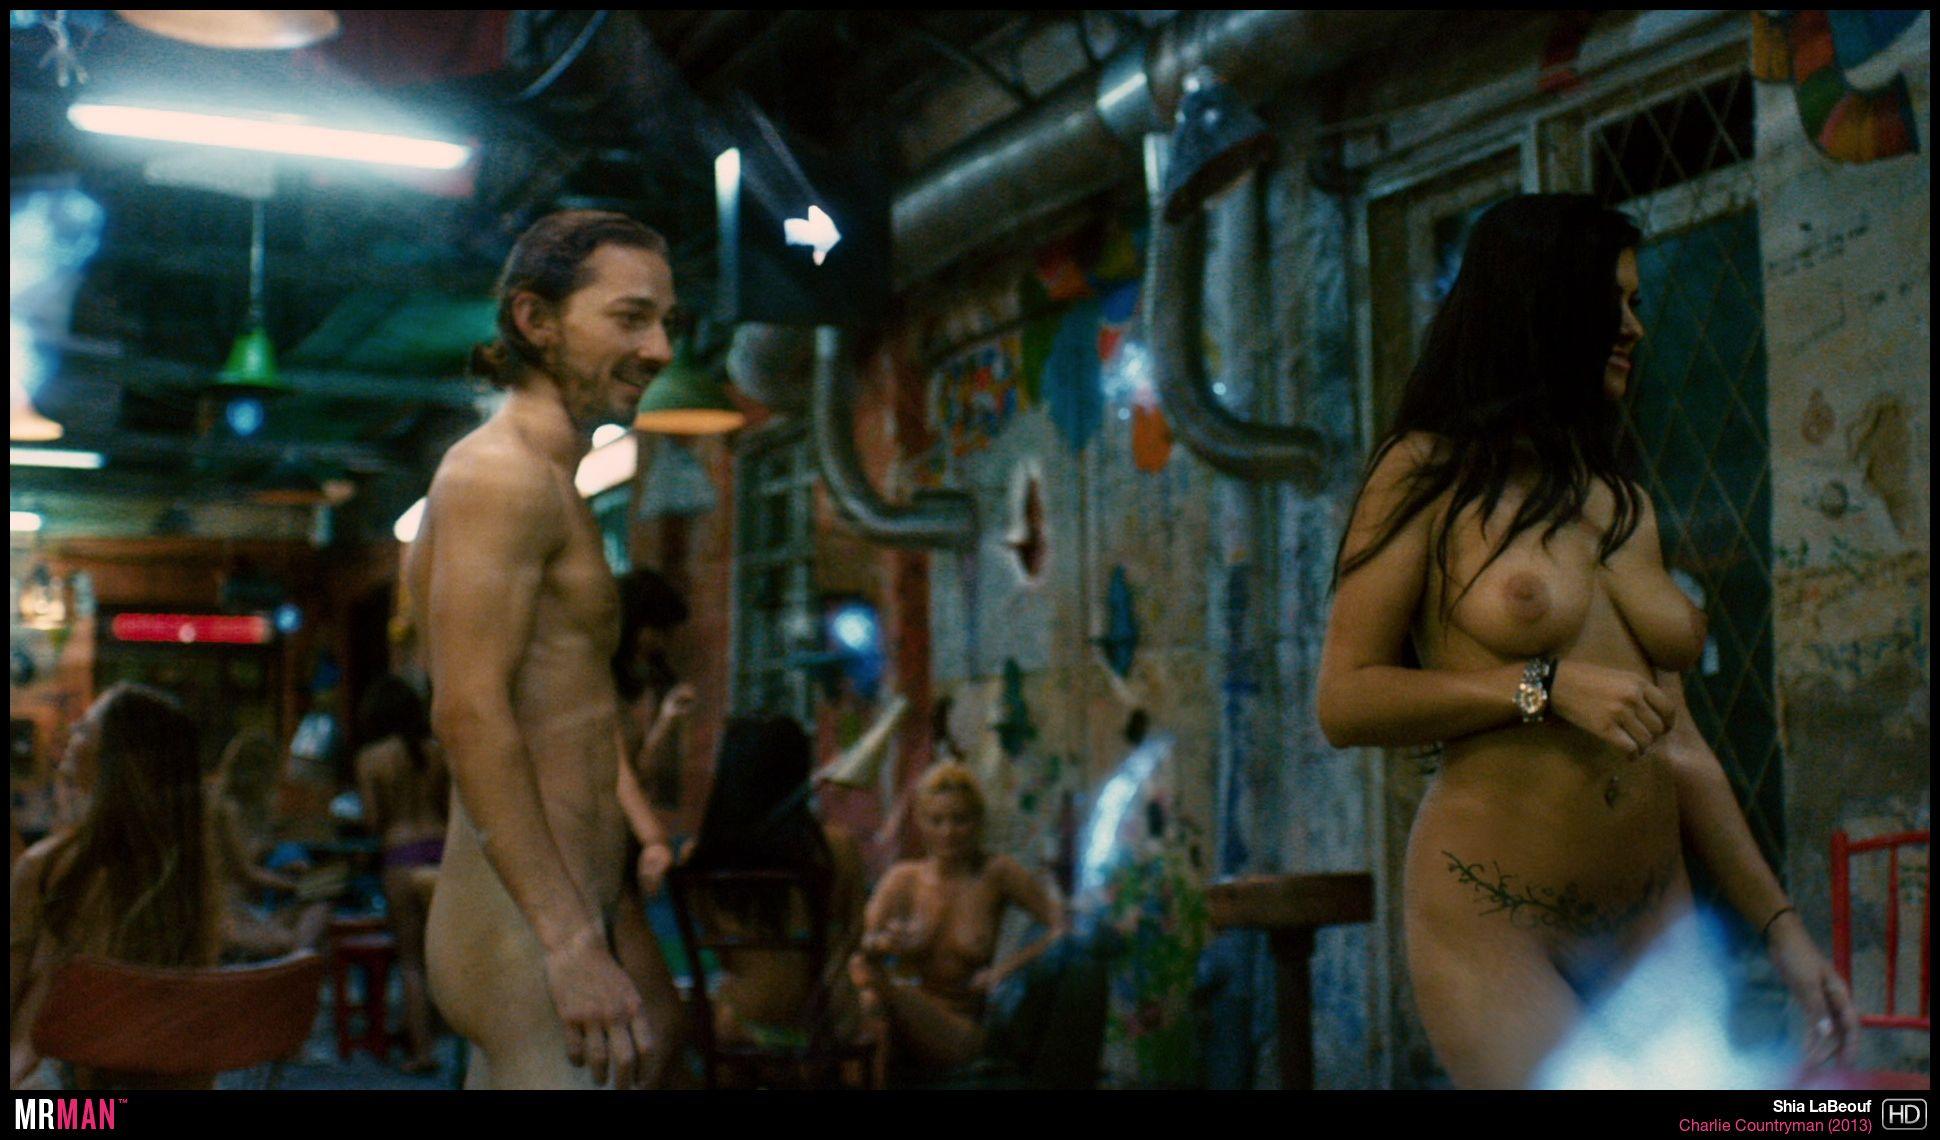 girls-go-naked-in-movie-halls